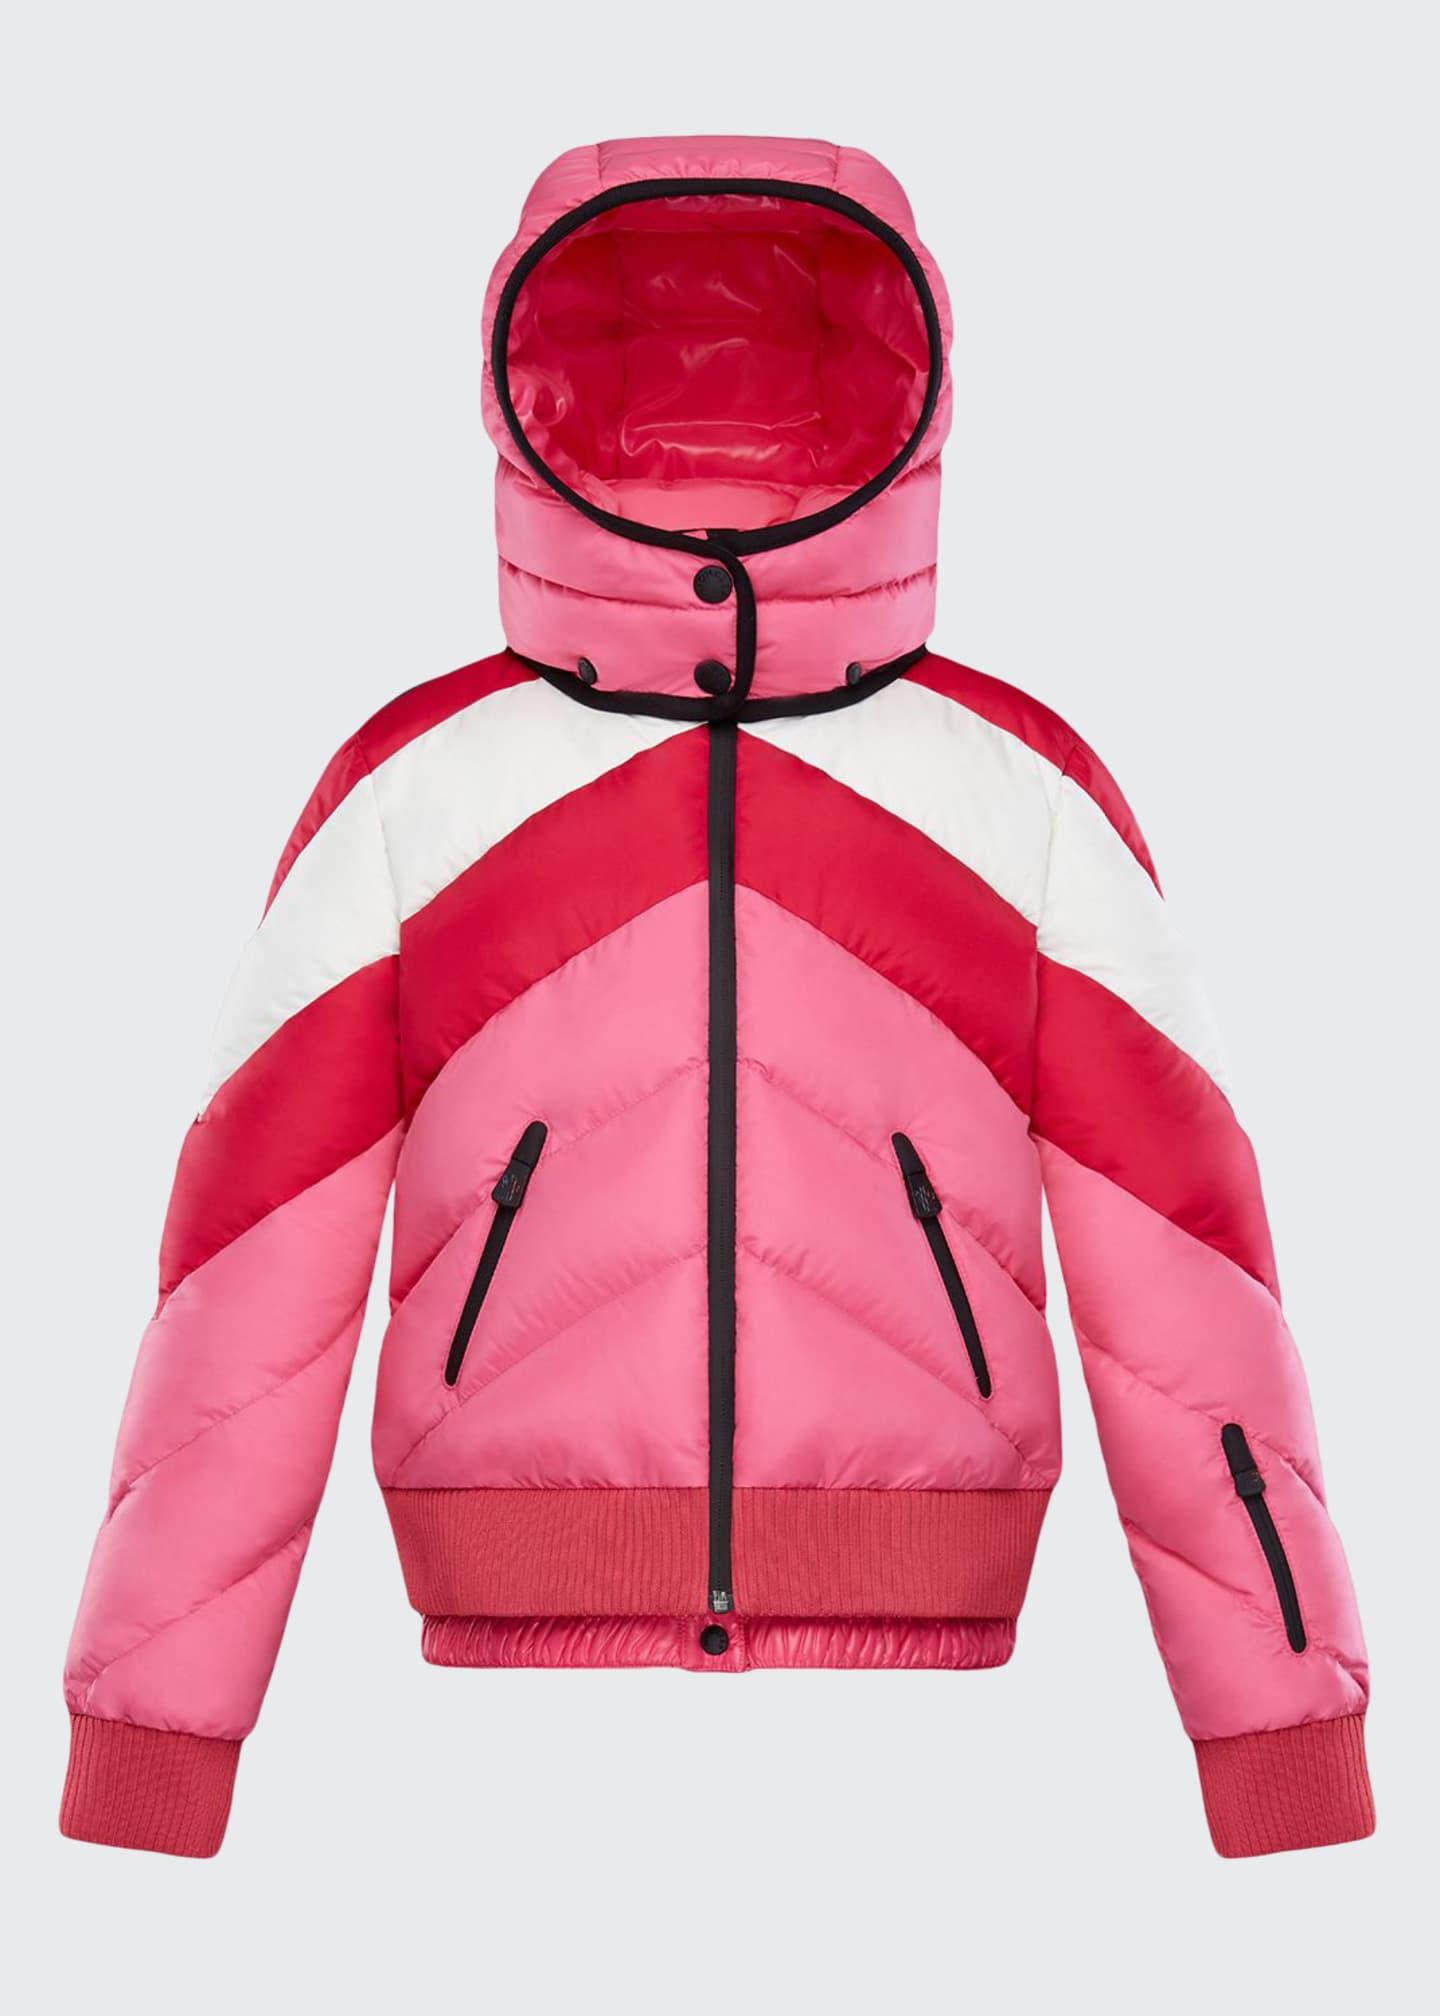 Moncler Charix Detachable-Hood Colorblock Puffer Coat, Size 4-6